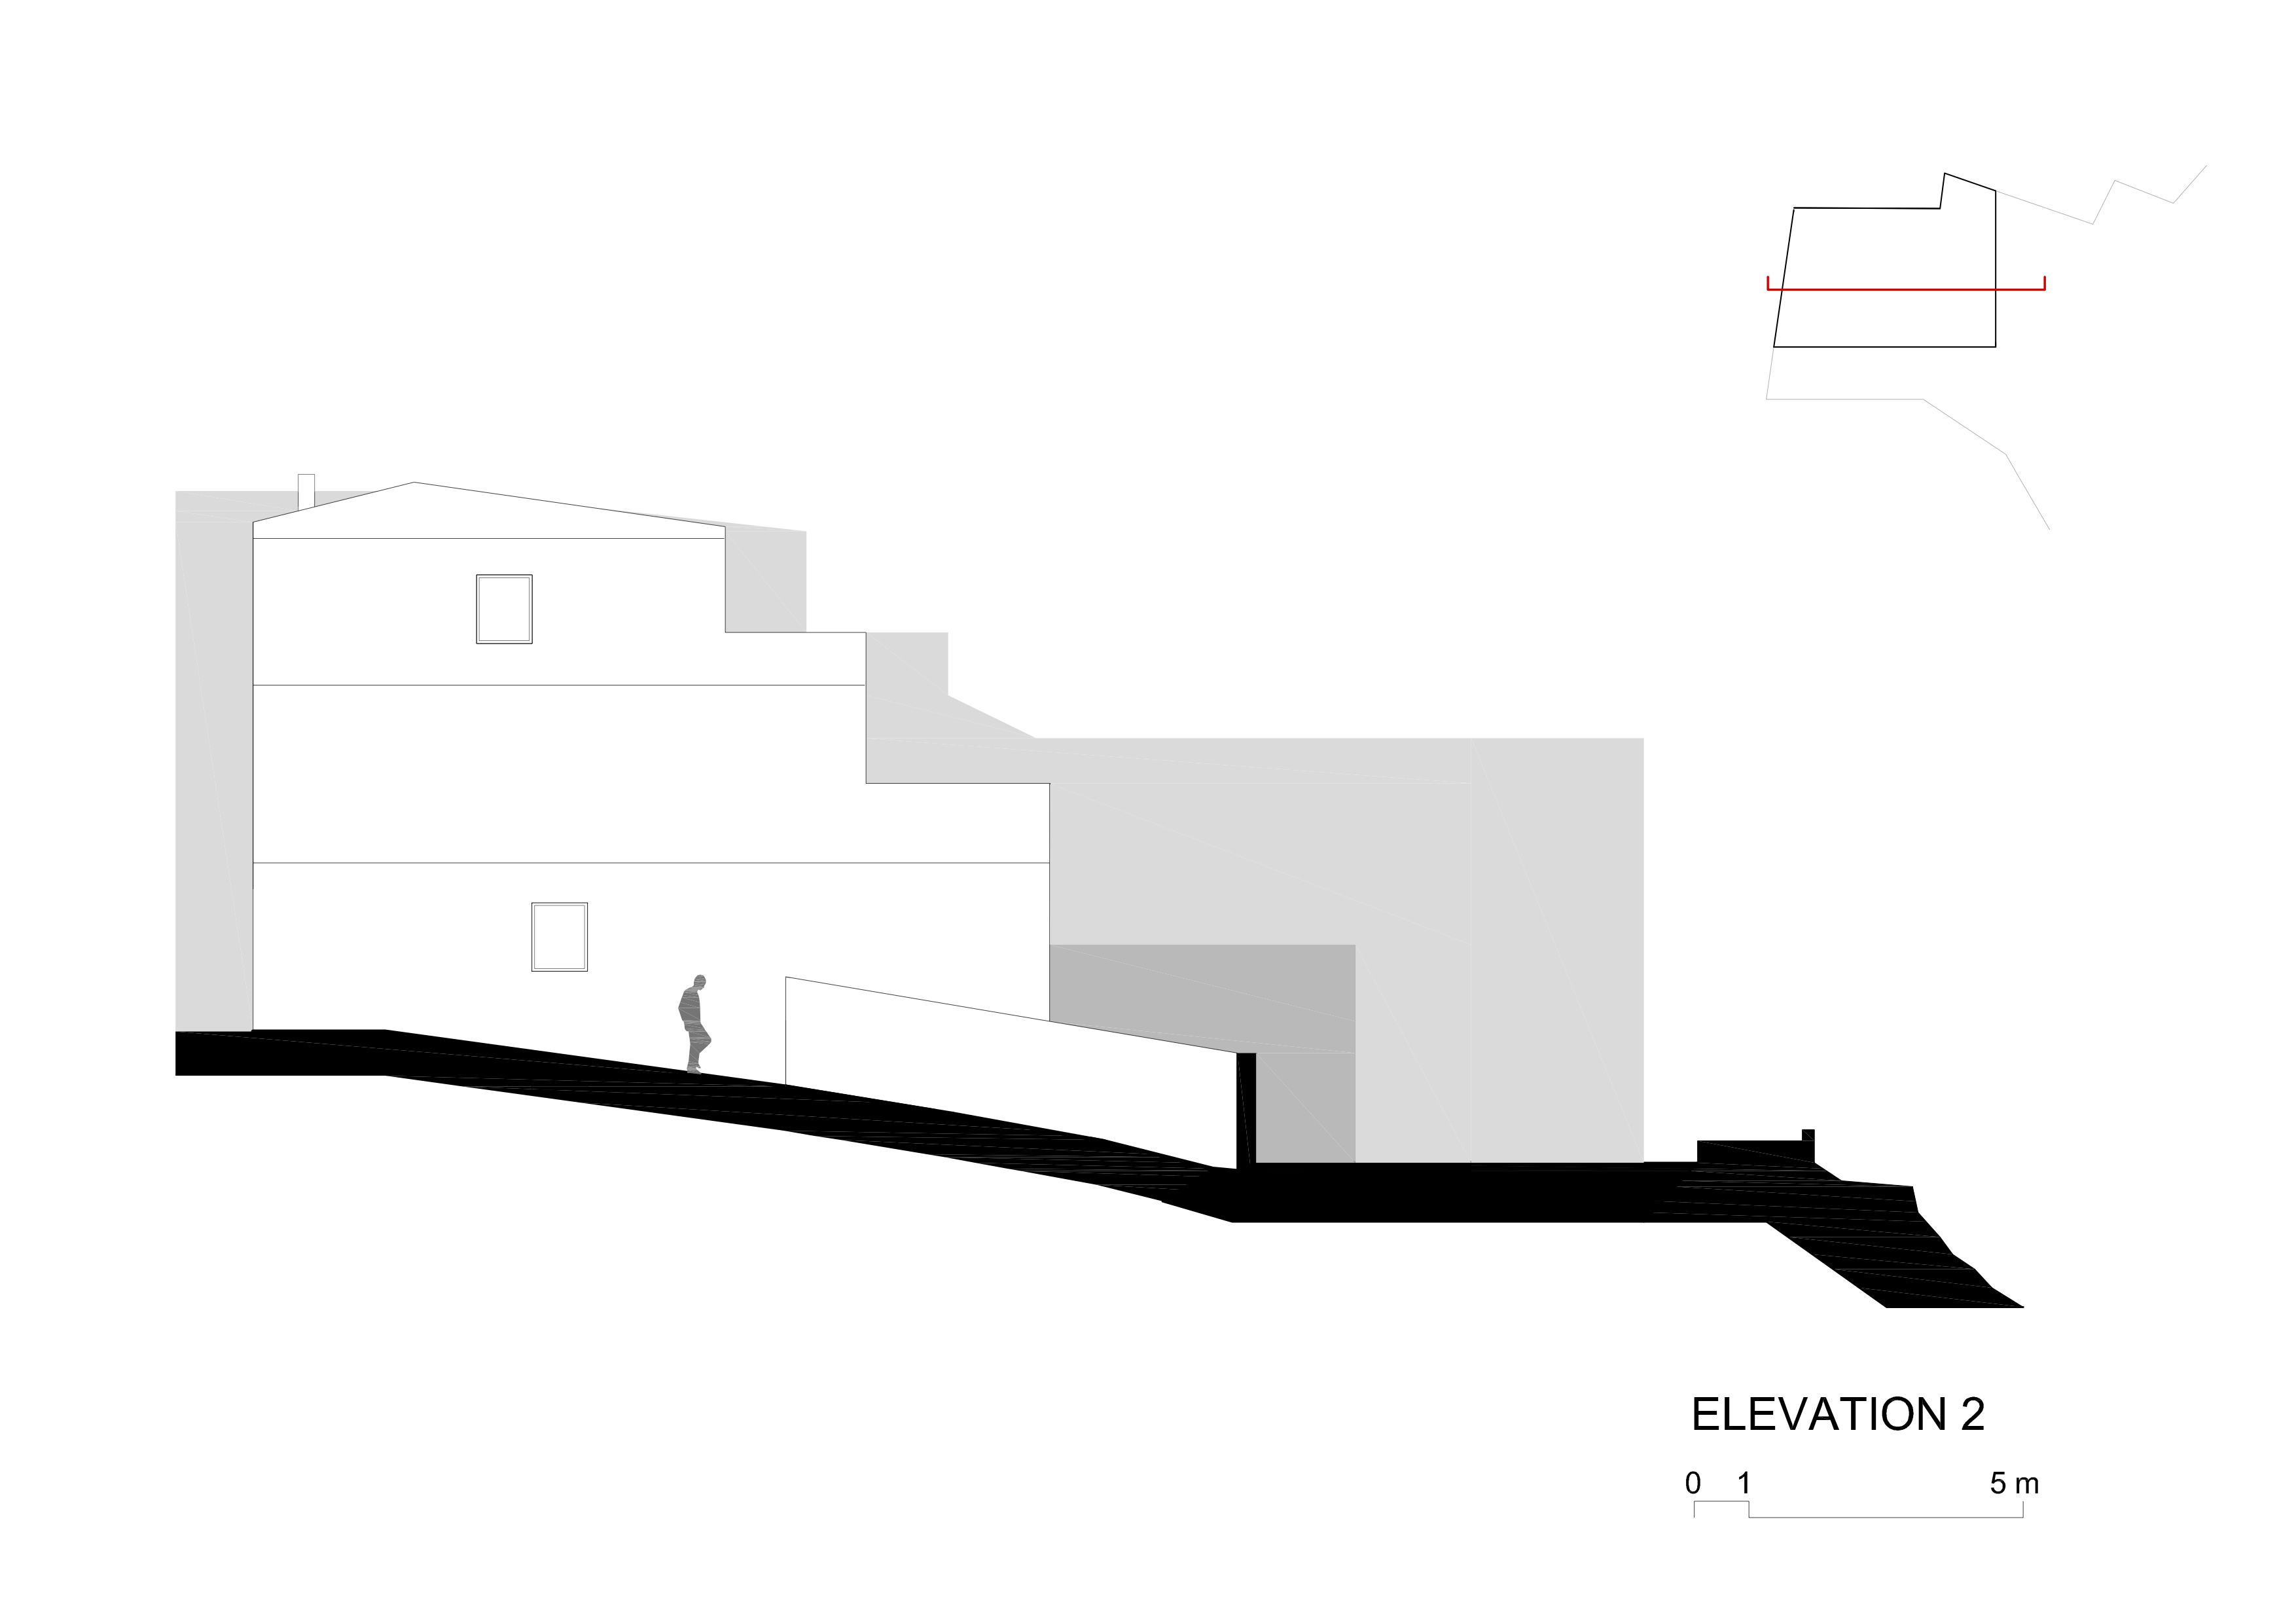 10_ELEVATION 2